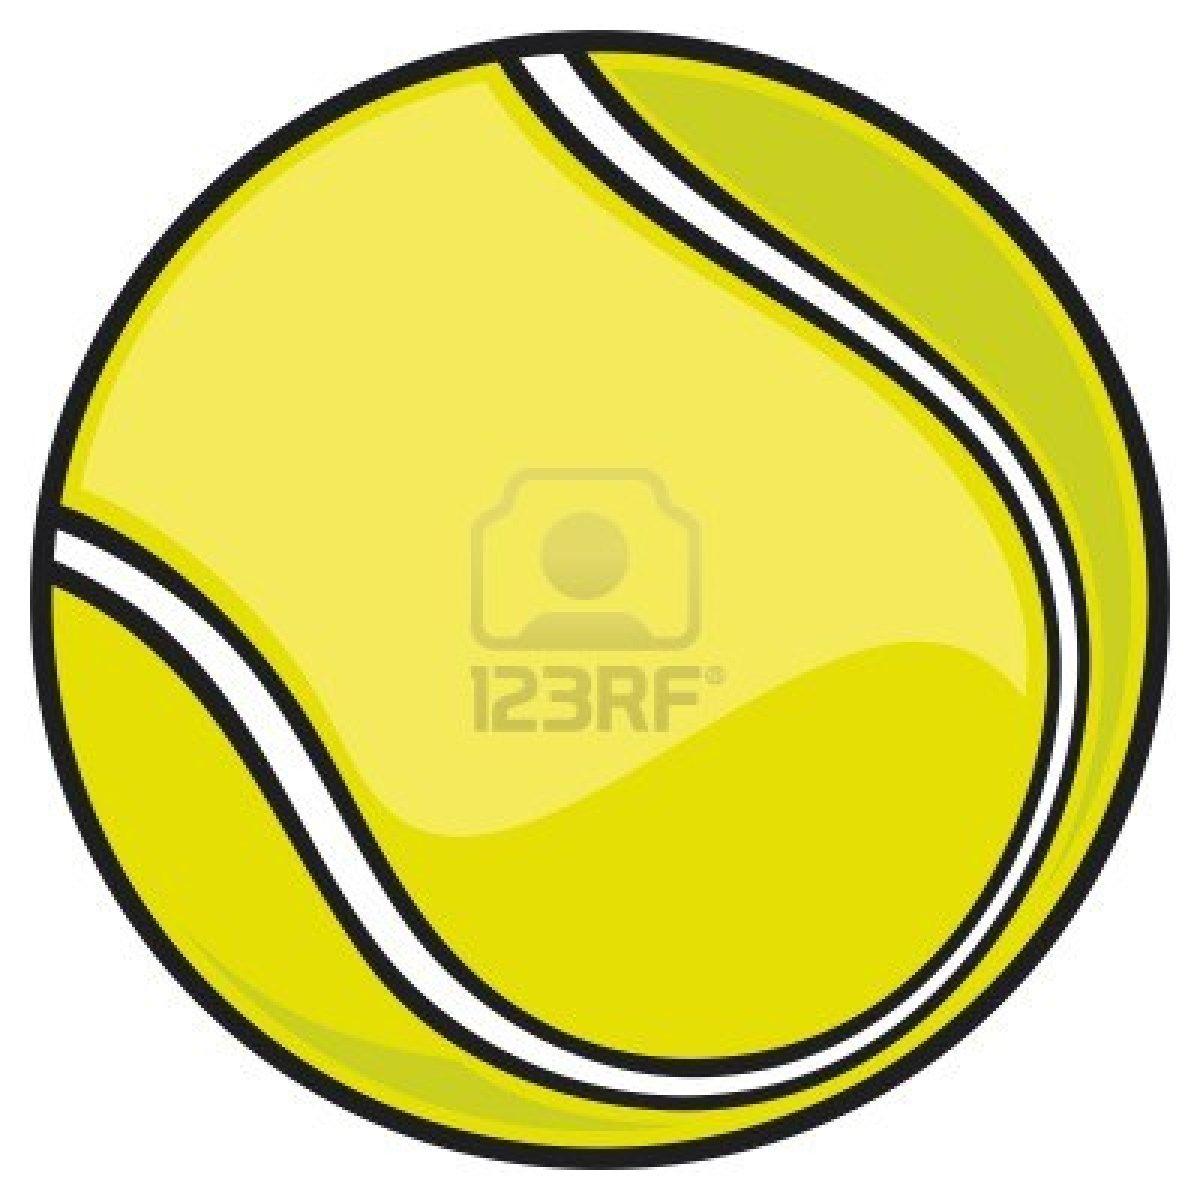 Tennis Ball Clipart Black And White   Clipart Panda   Free Clipart